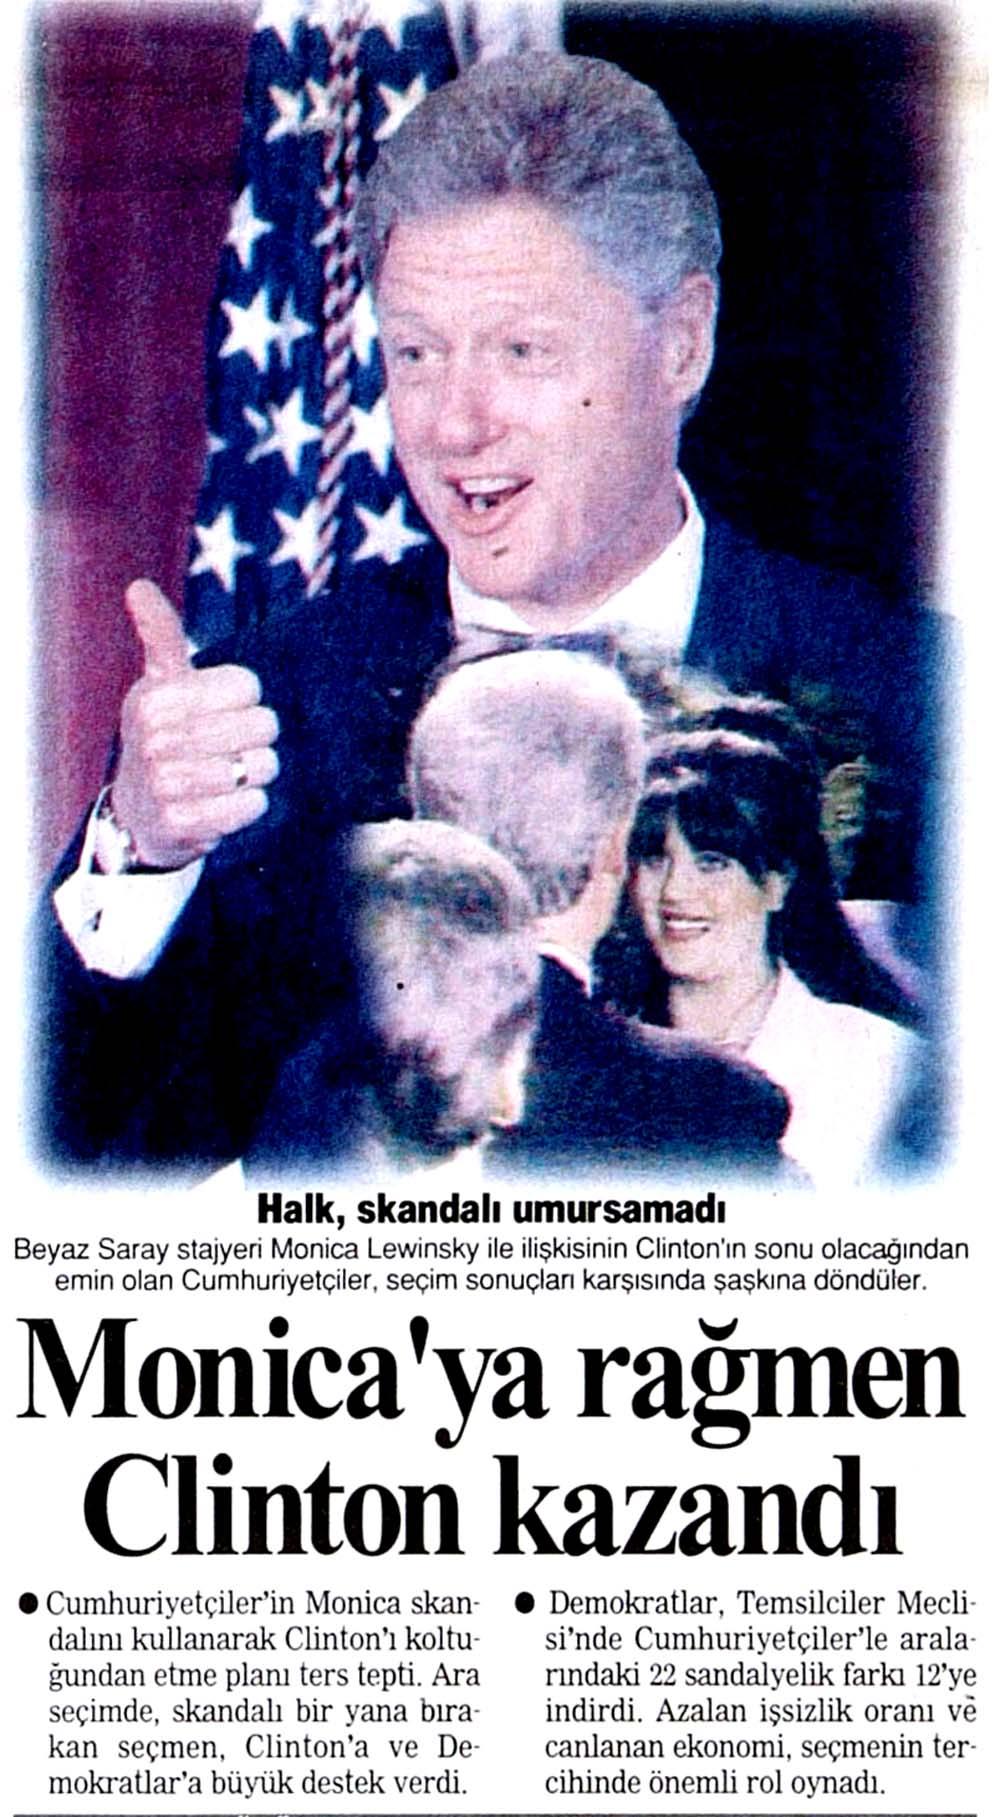 Monica'ya rağmen Clinton kazandı